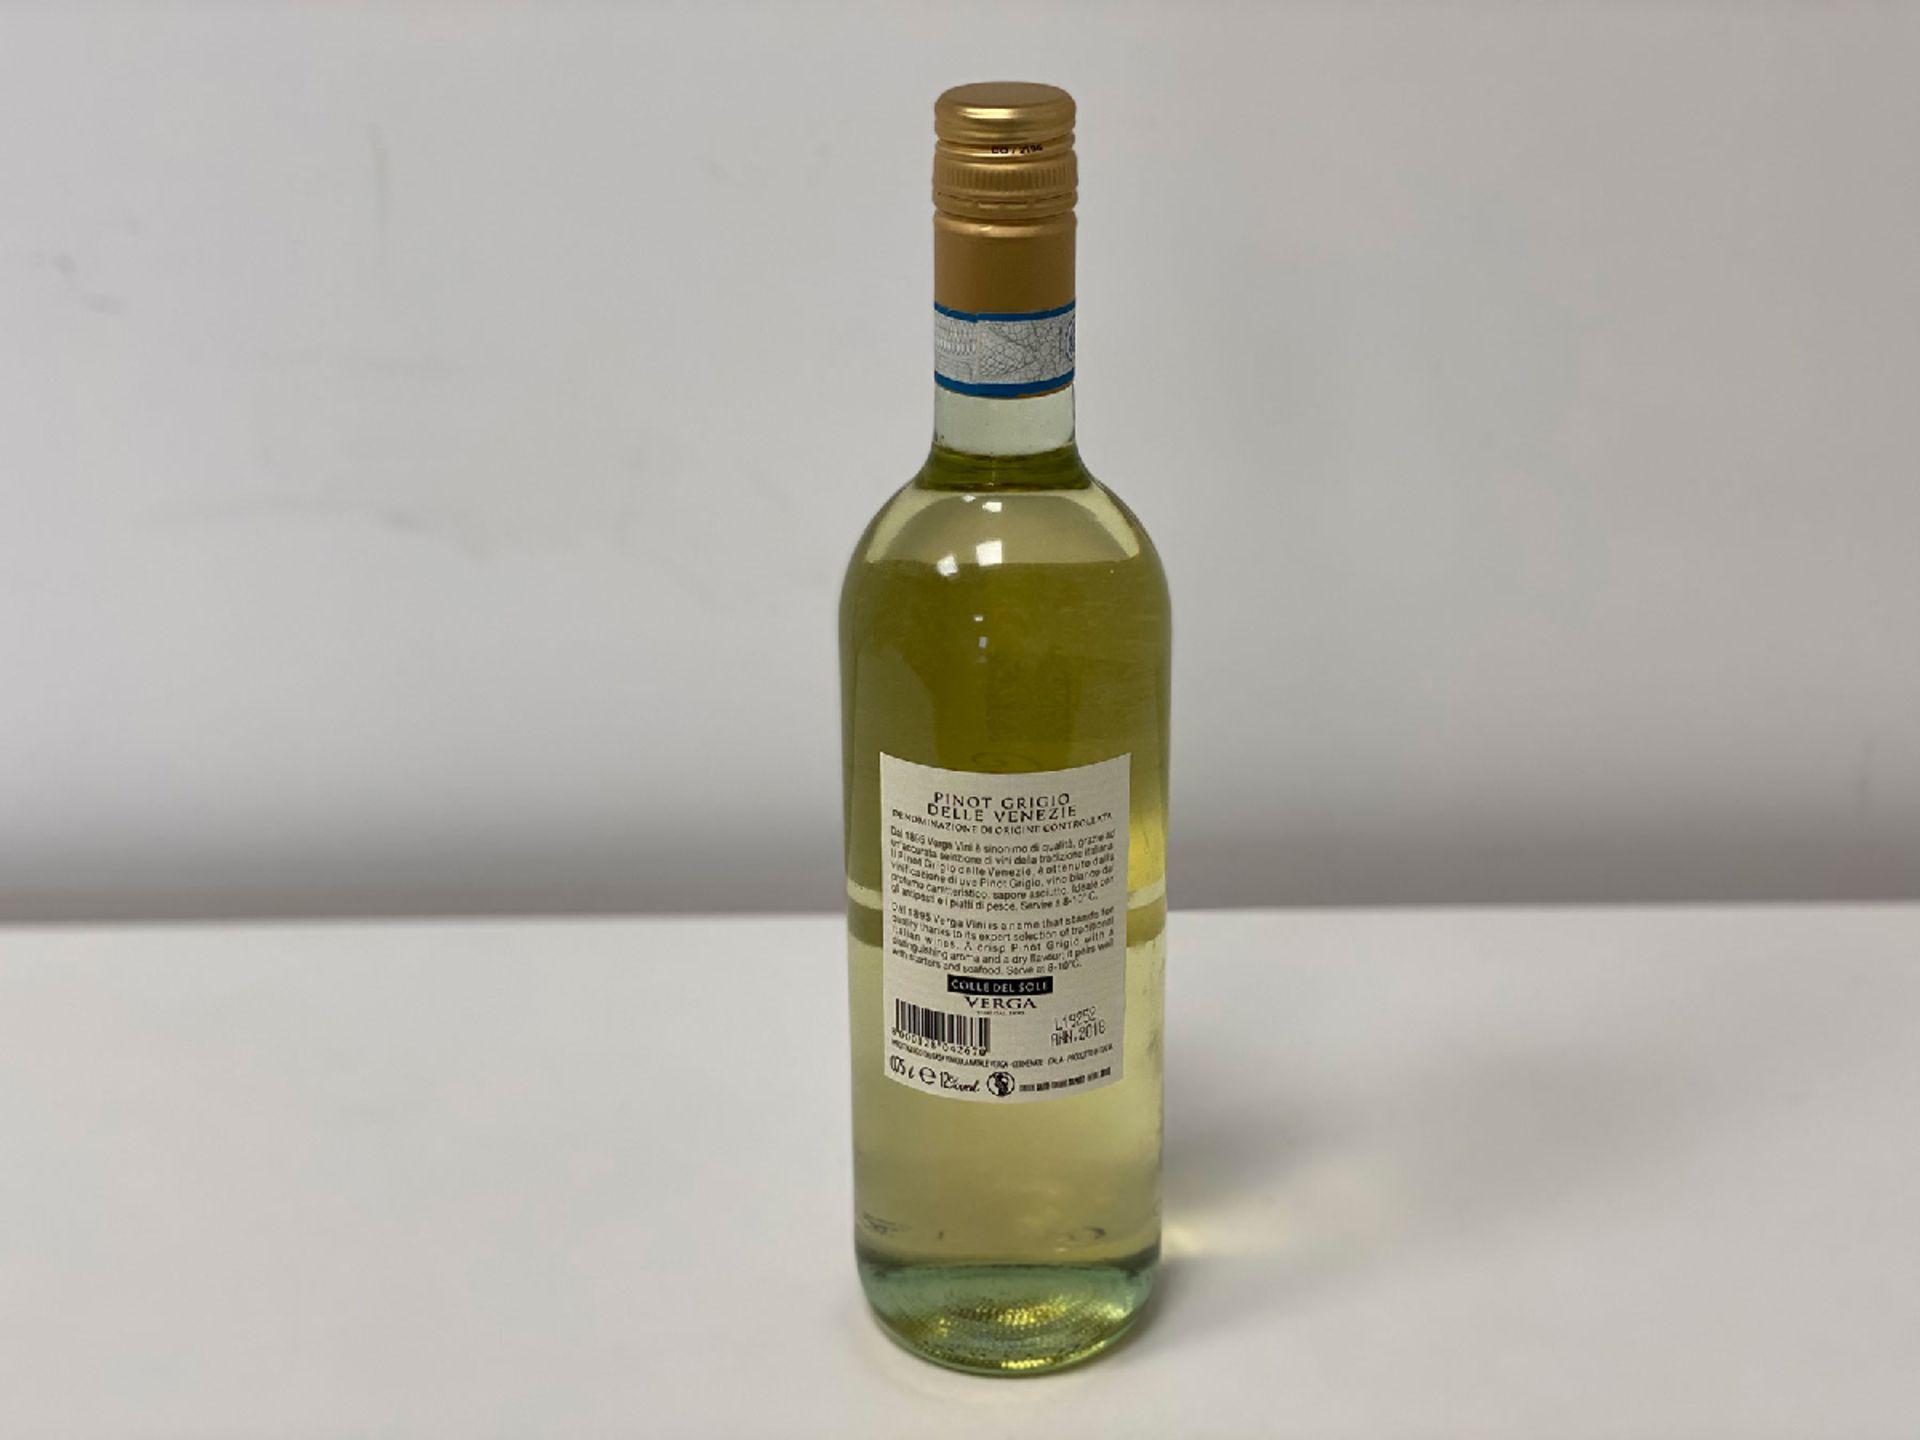 6 Bottles (1 Case) of Natale Verga - Pinot Grigio - Colle del Sole - Venezie DOC - Natale Verga - V - Image 2 of 2